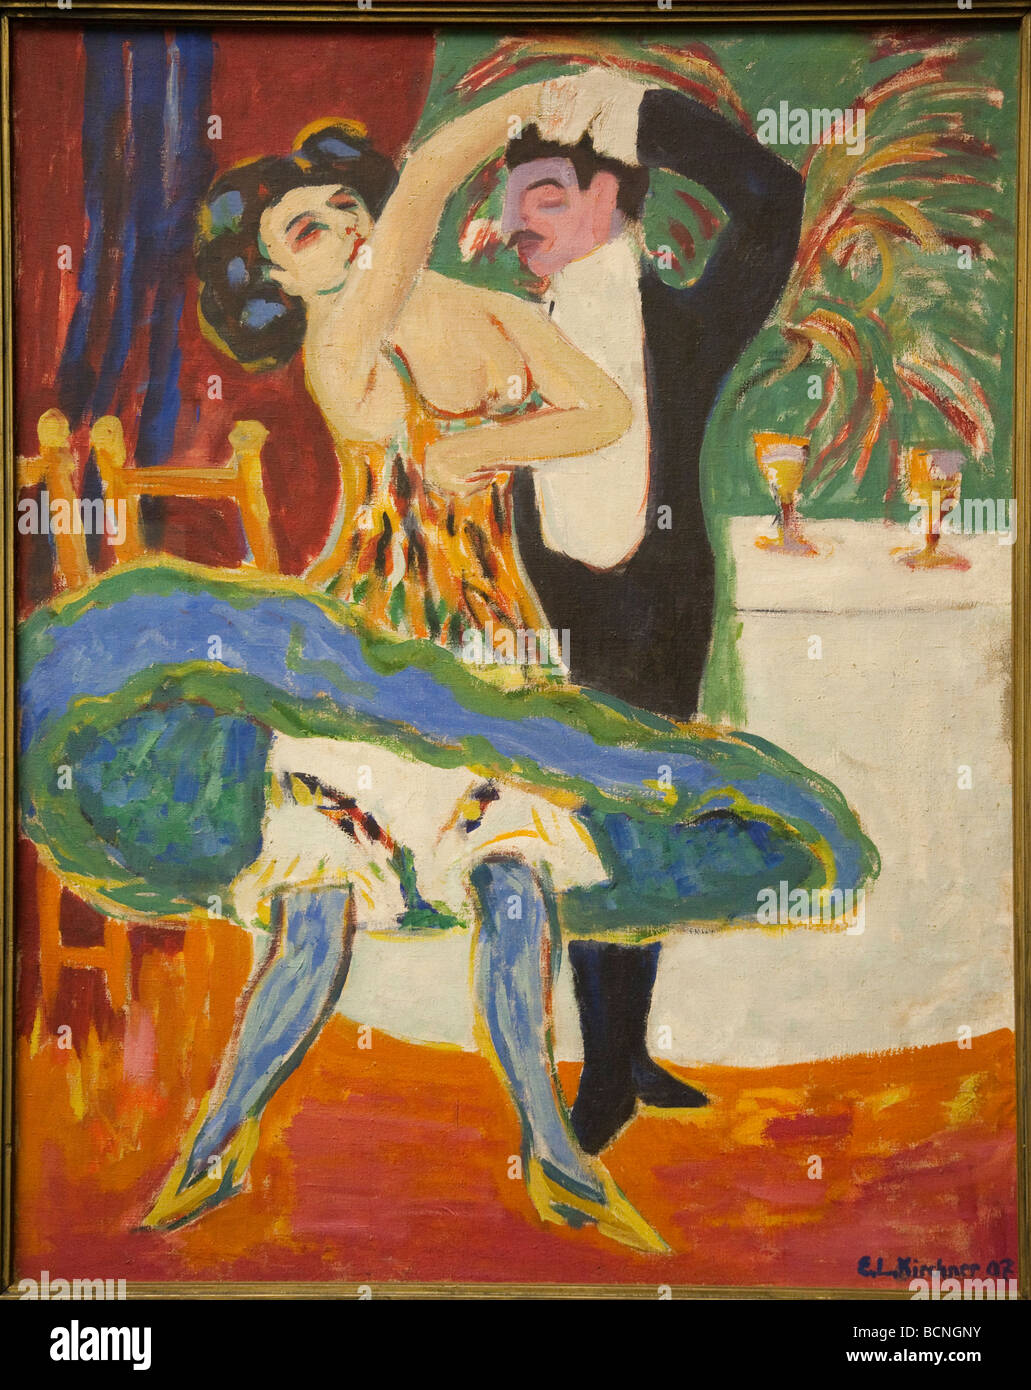 Ernst Ludwig Kirchner 1880 to 1938 Variete 1910 oil on canvas - Stock Image